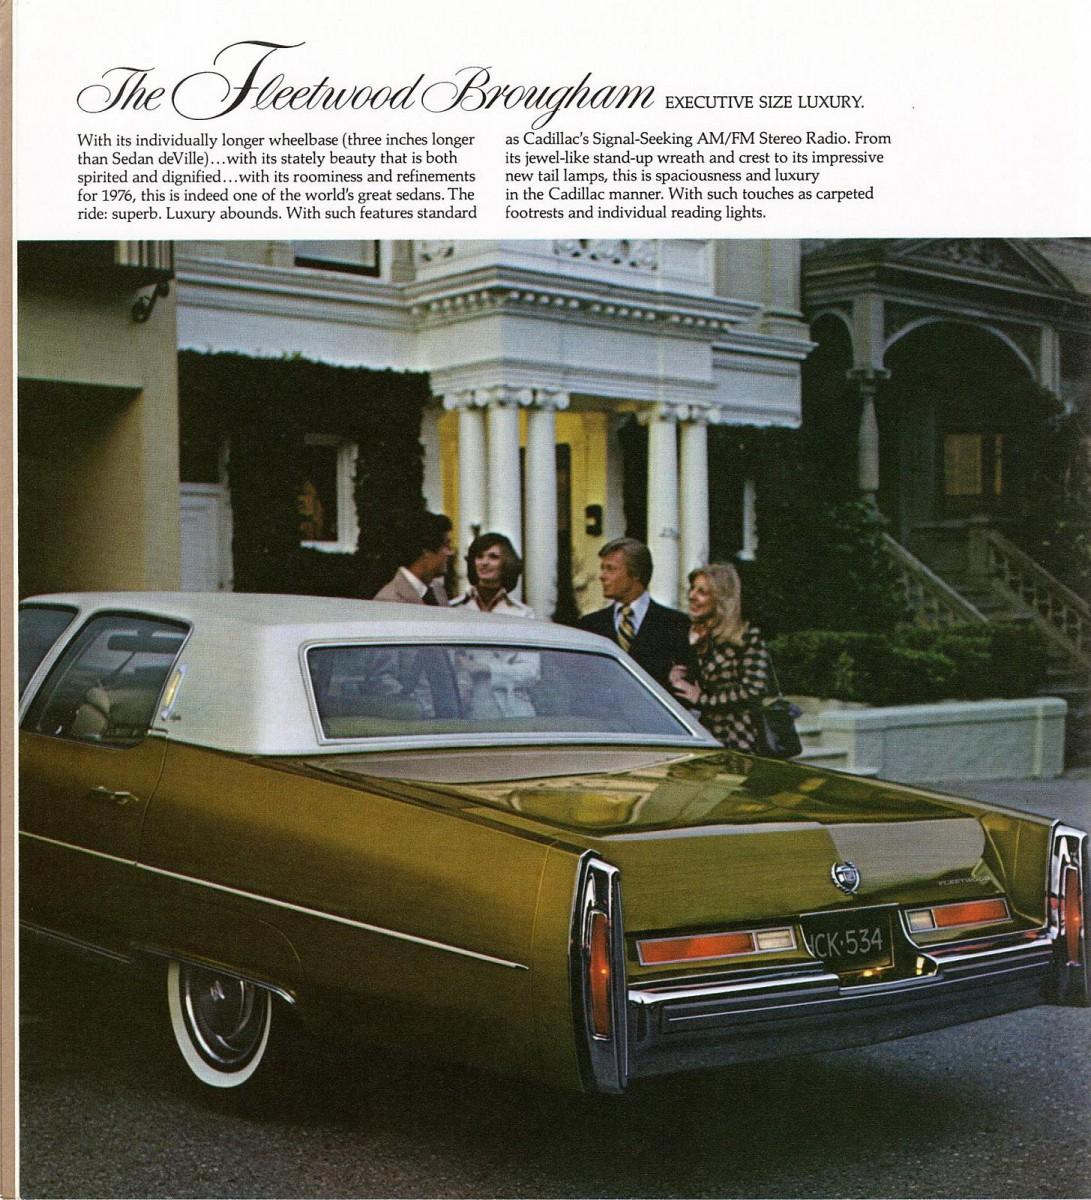 1976 Cadillac Full Line Prestige-05FleetwoodBrougham